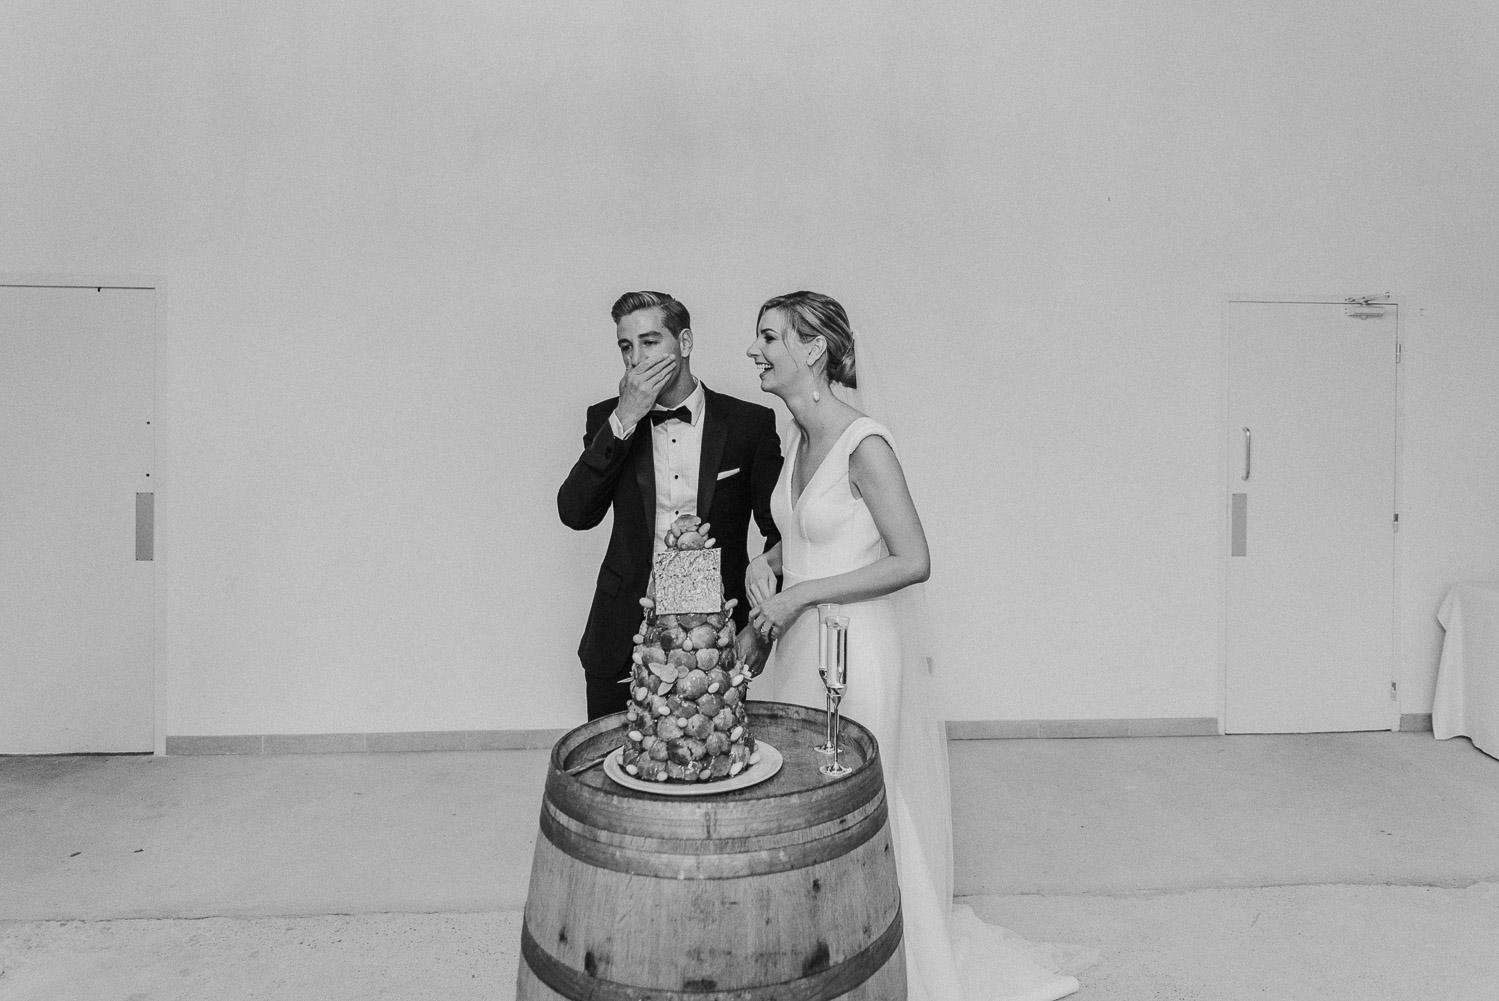 dordogne_eymet_wedding_france_katy_webb_photography_france_UK126